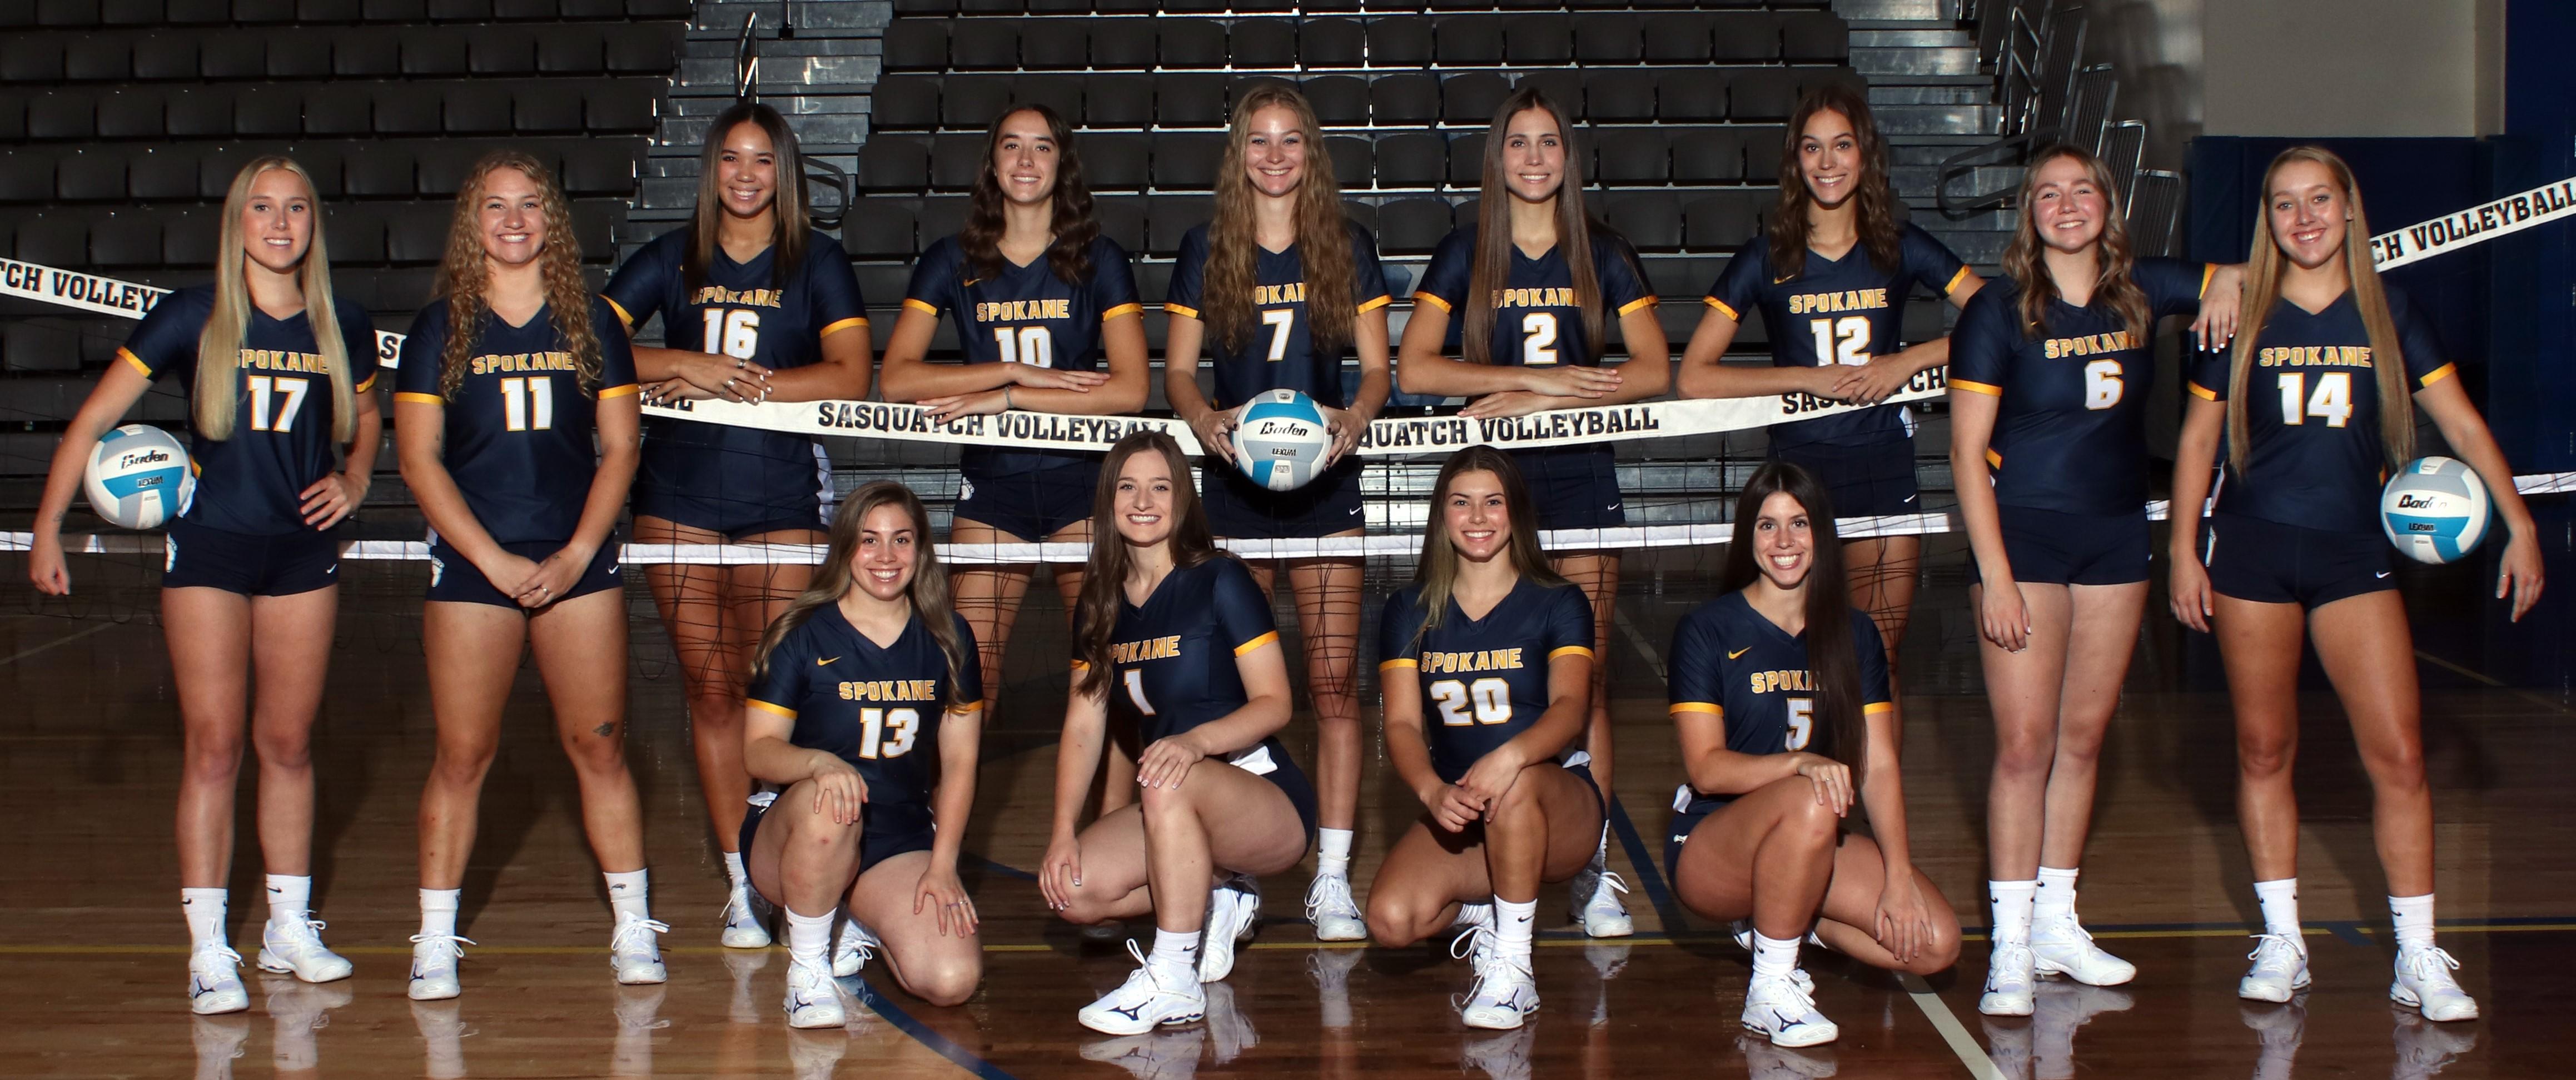 Spokane team photo